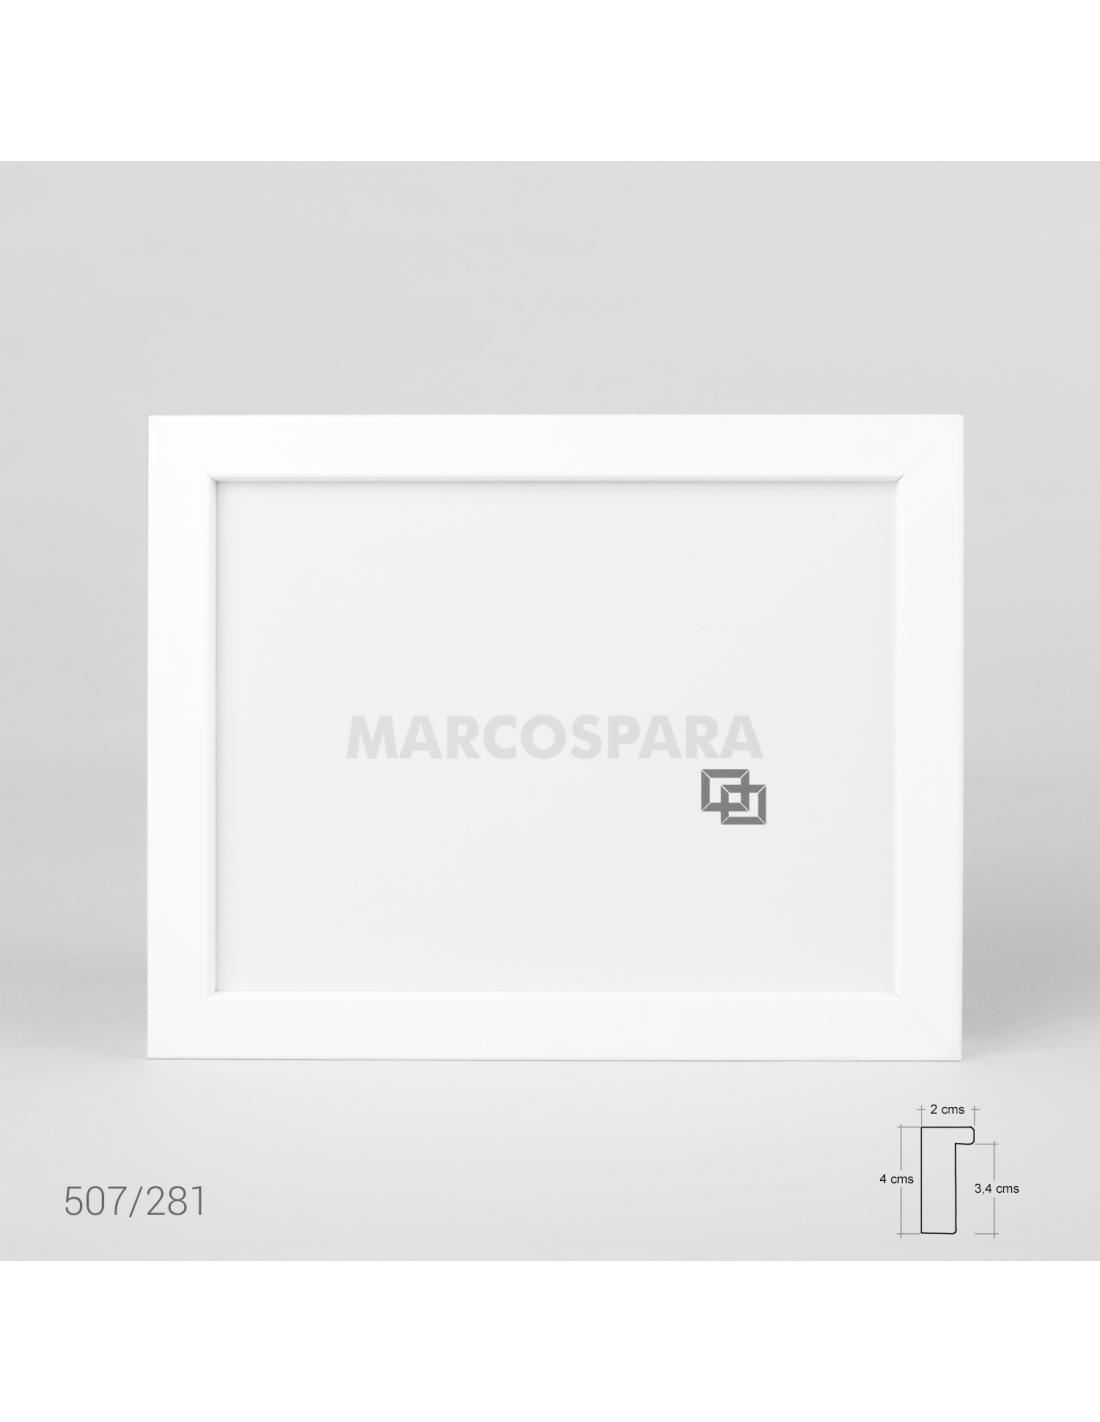 Marcos de madera para posters M507